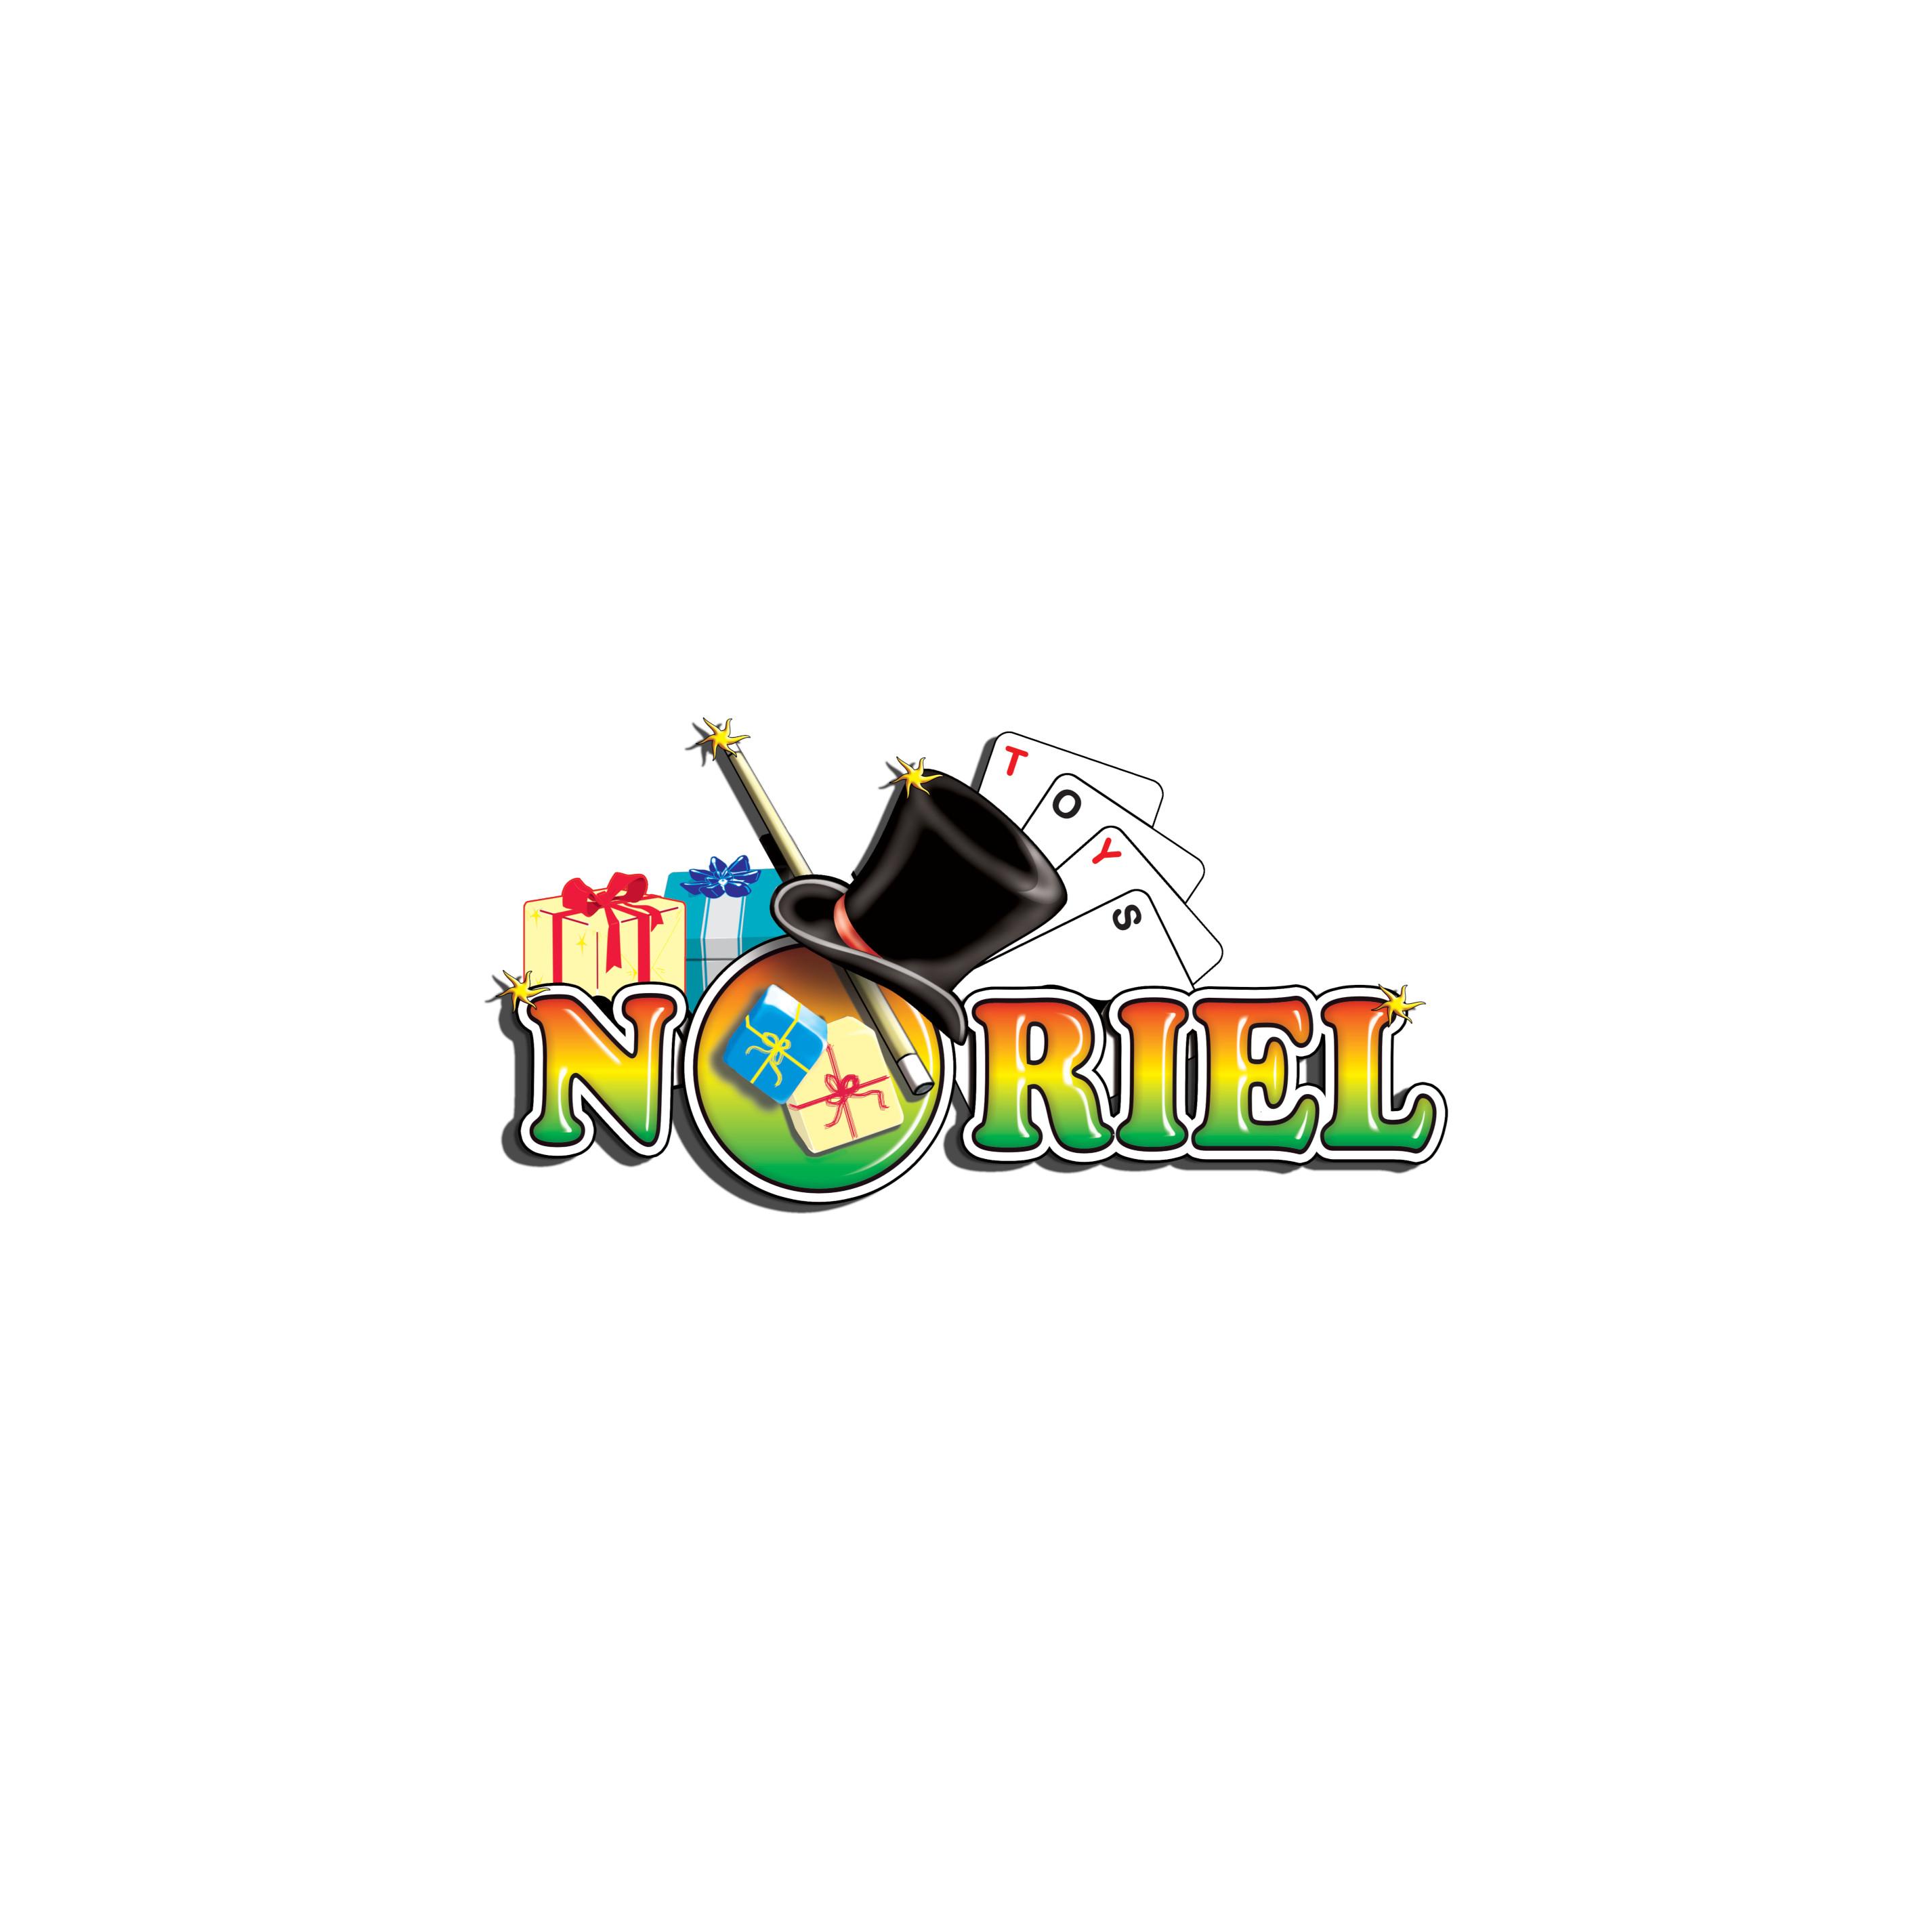 H1127AAPTC000_001 Joie - Scaun de masa Mimzy Snacker Petite City